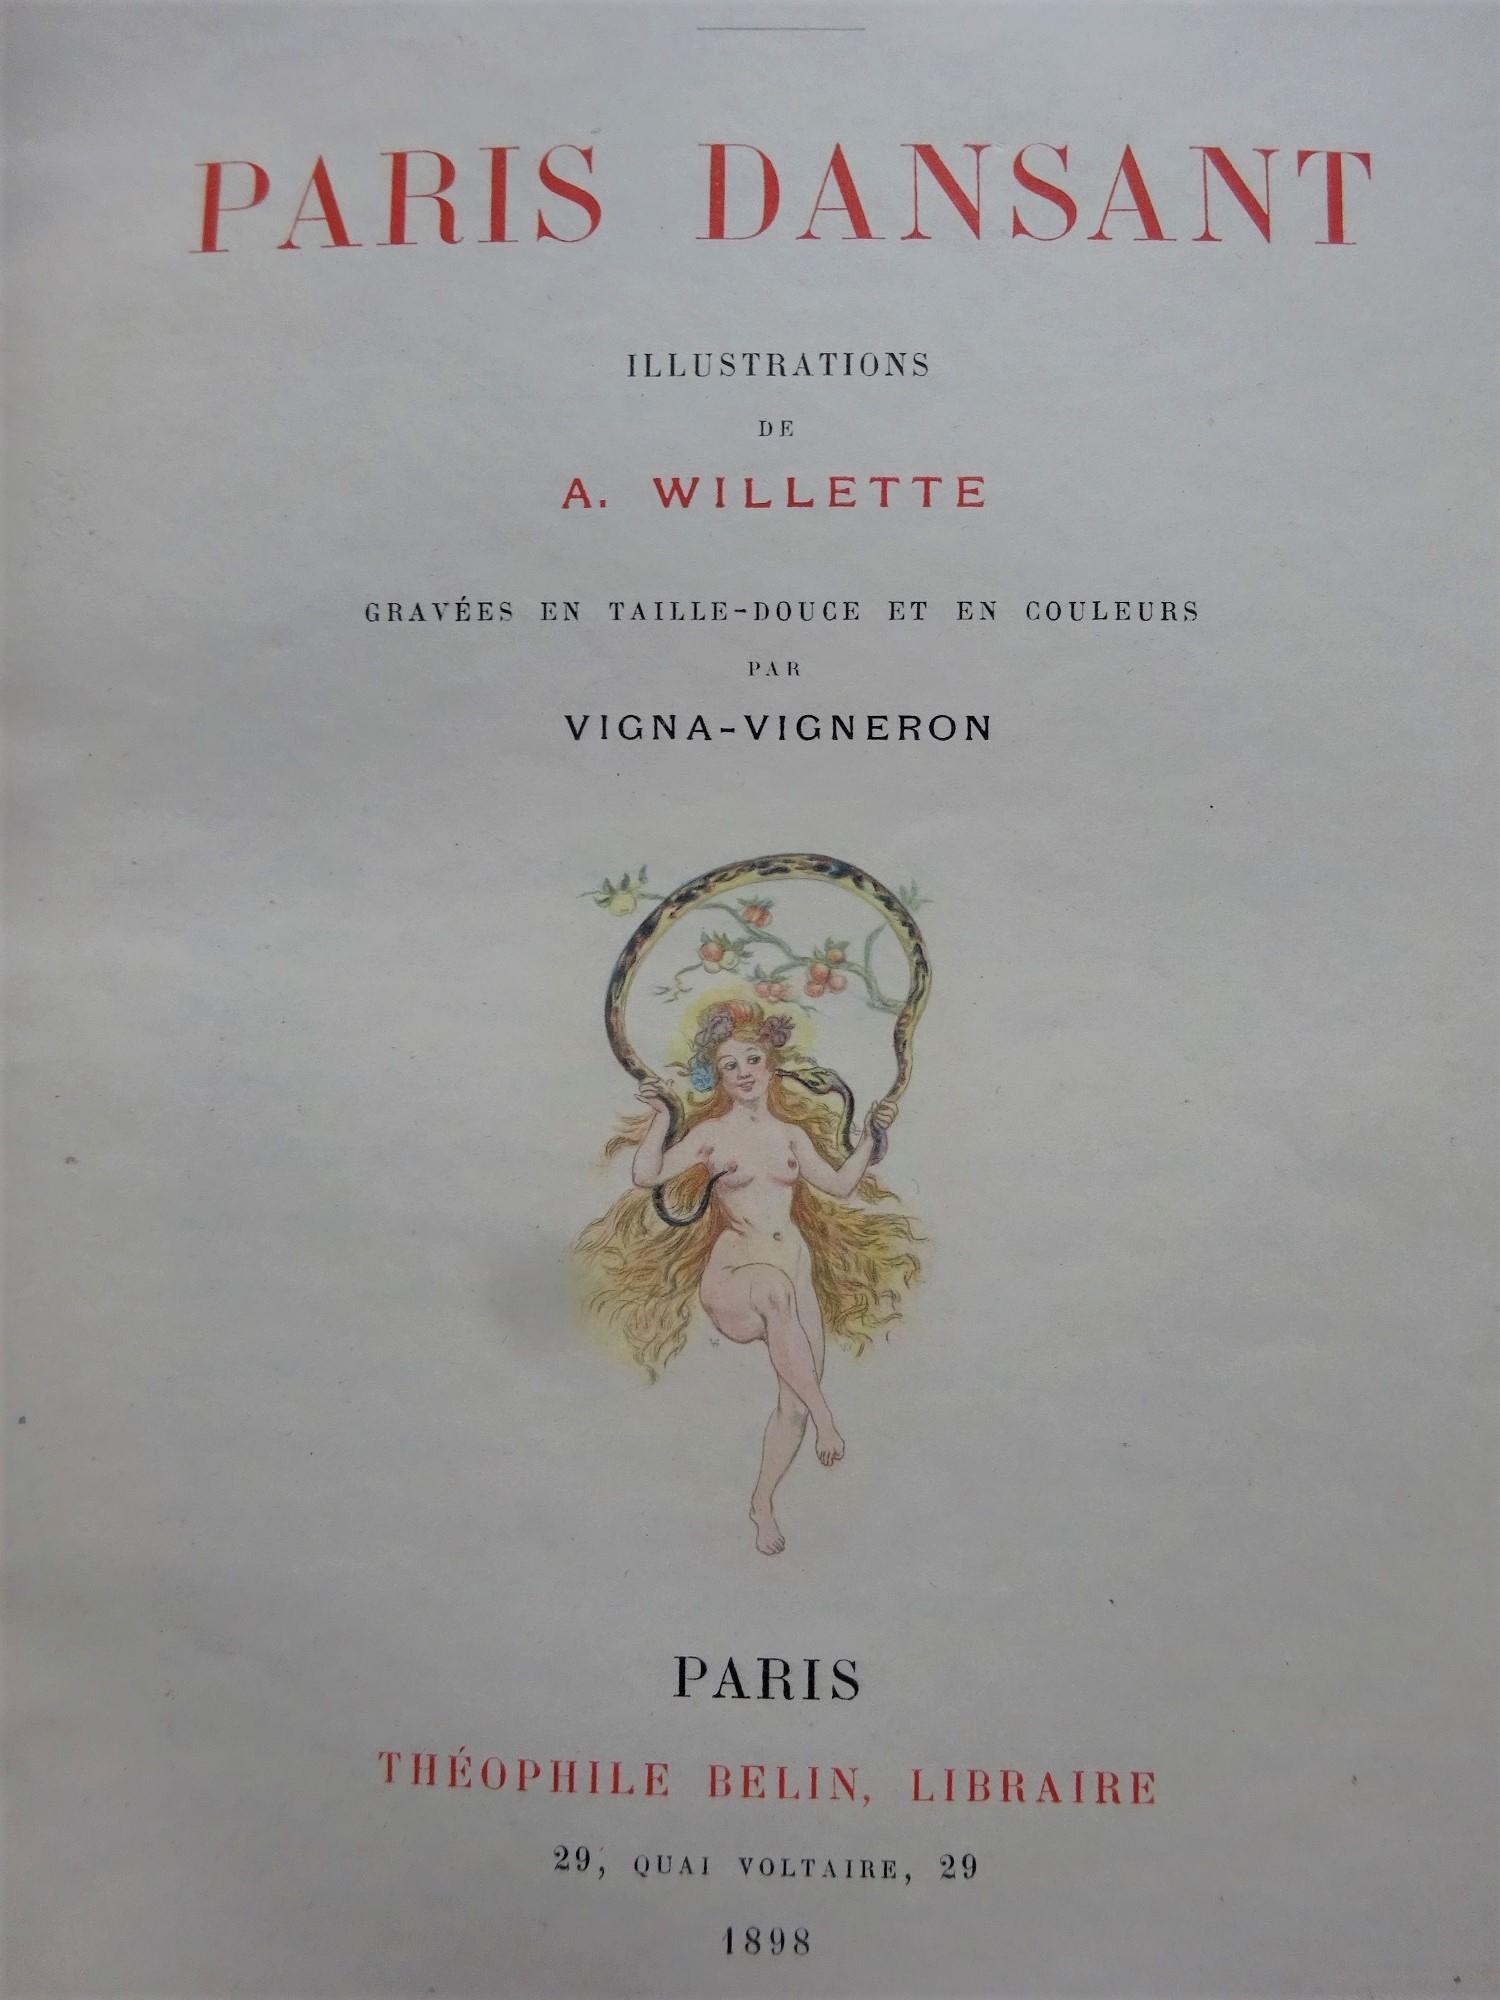 Paris dansant